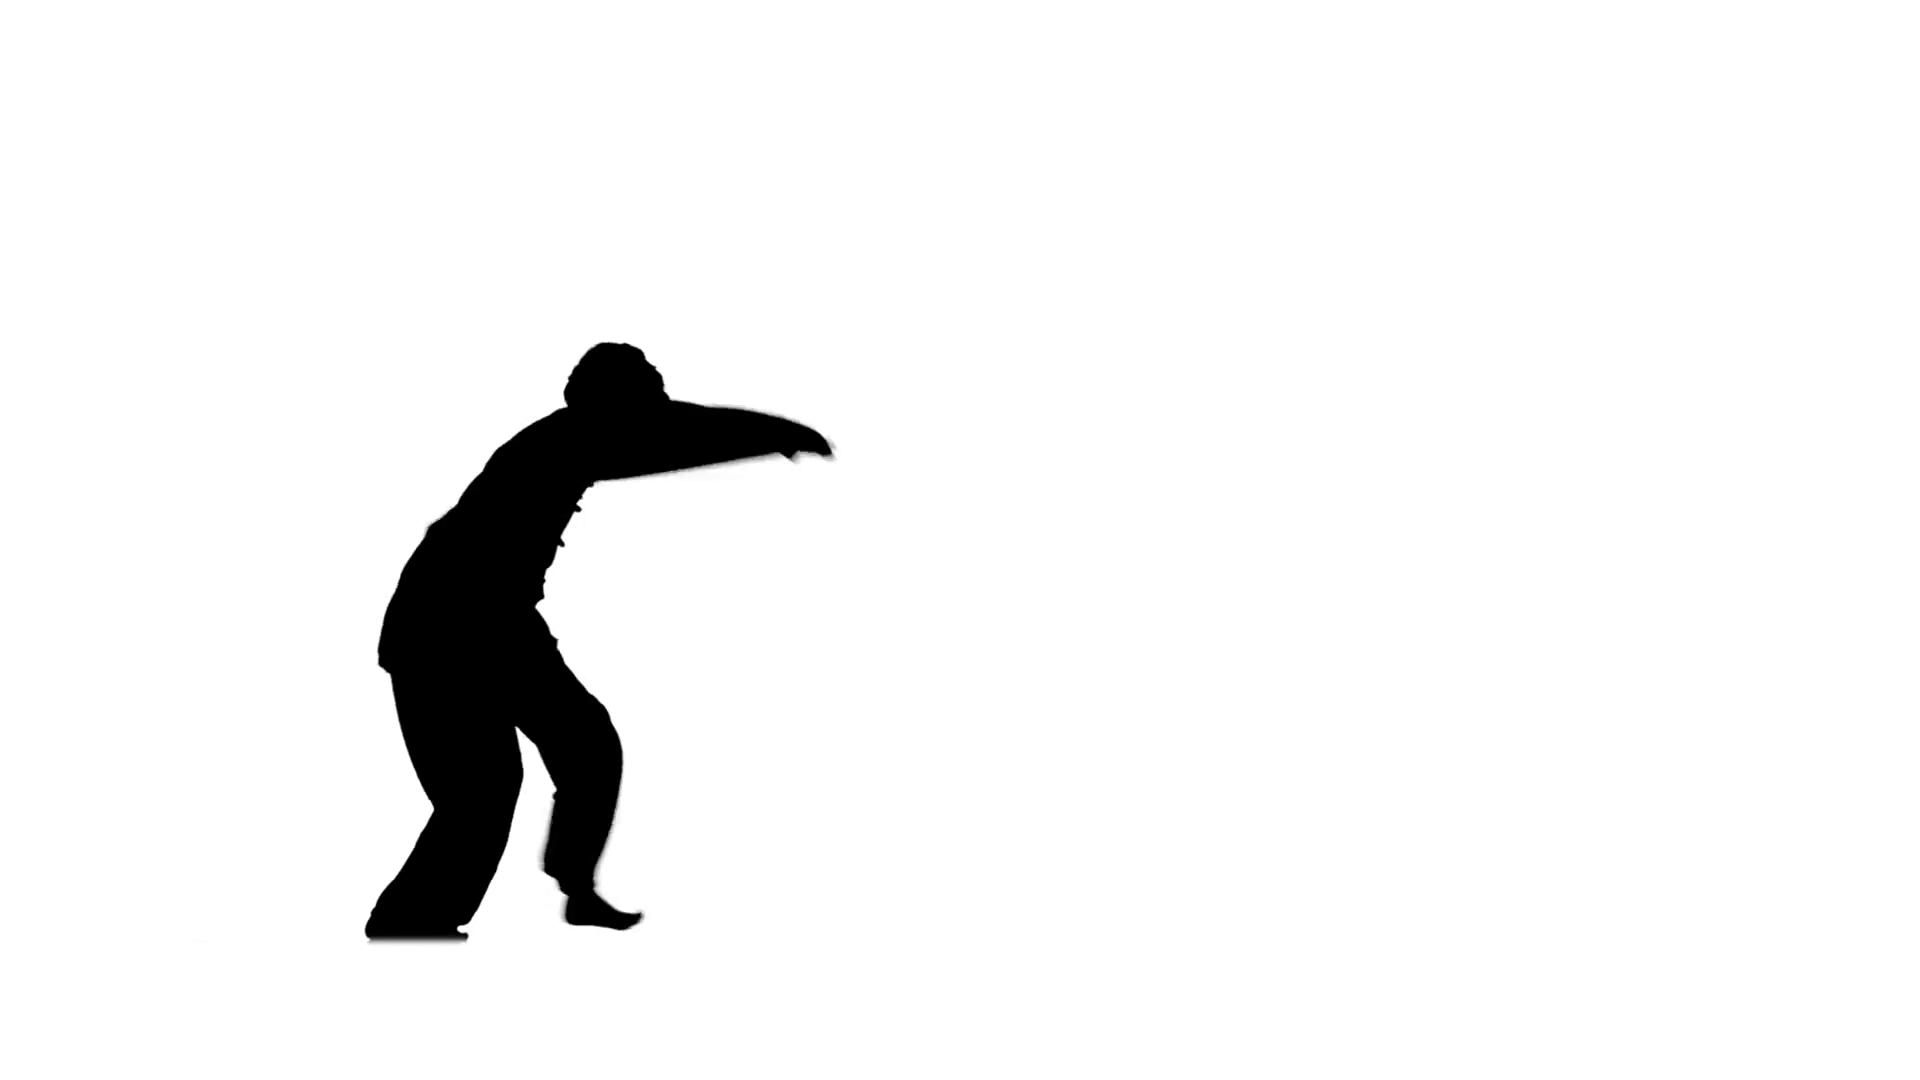 1920x1080 Man Training Taekwondo Or Karate, Silhouette, Slow Motion Motion